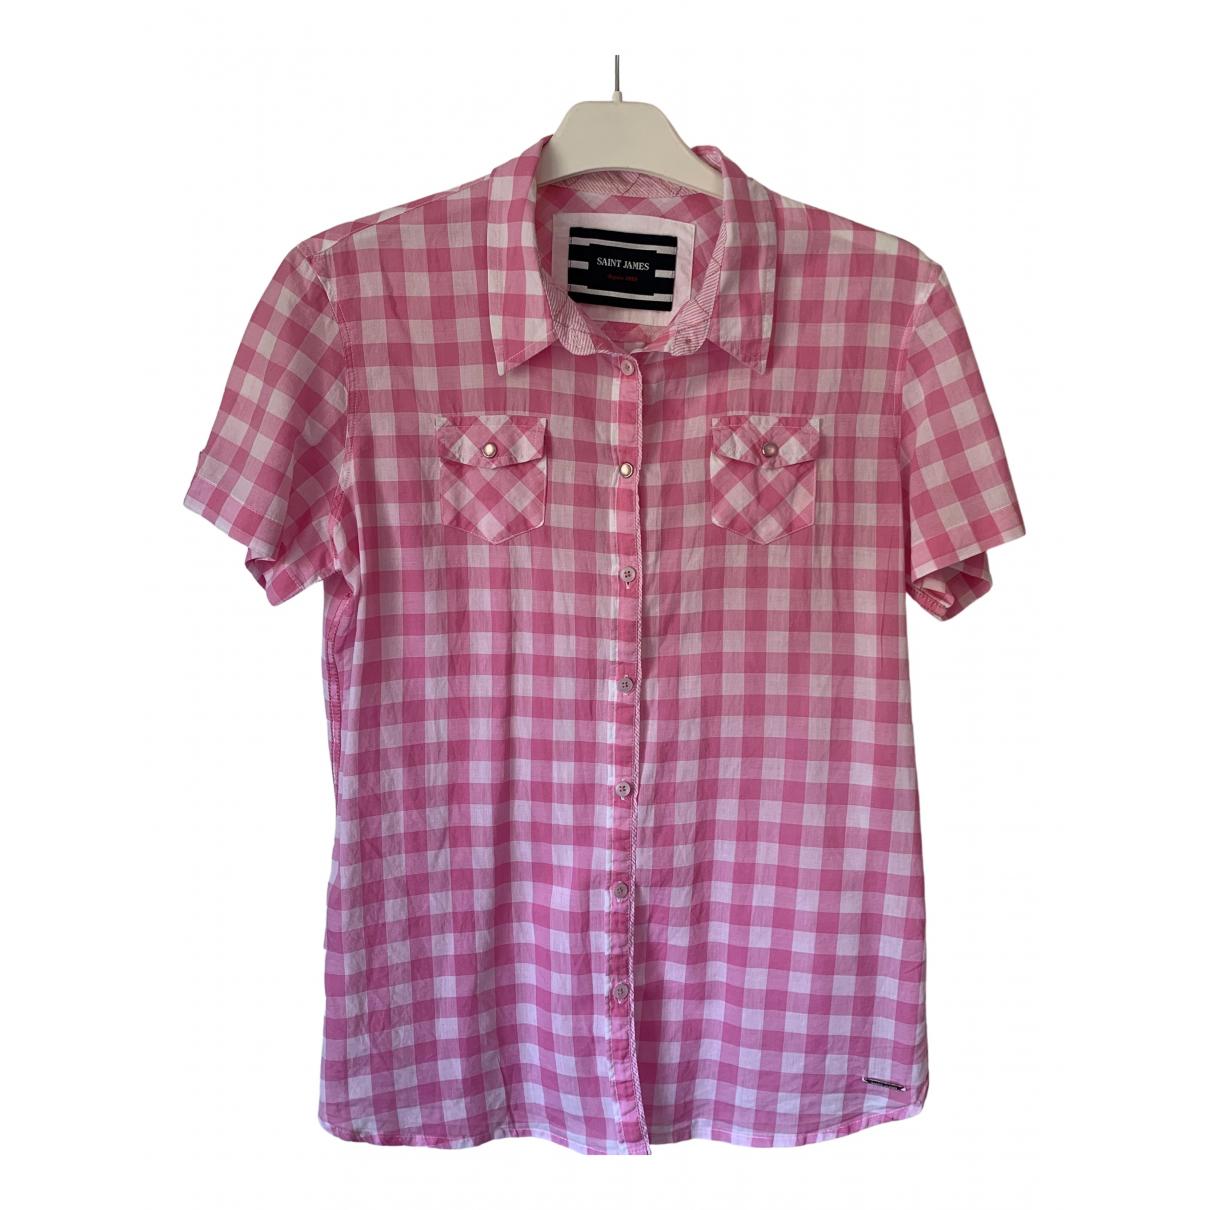 Saint James \N Pink Cotton  top for Women 38 FR